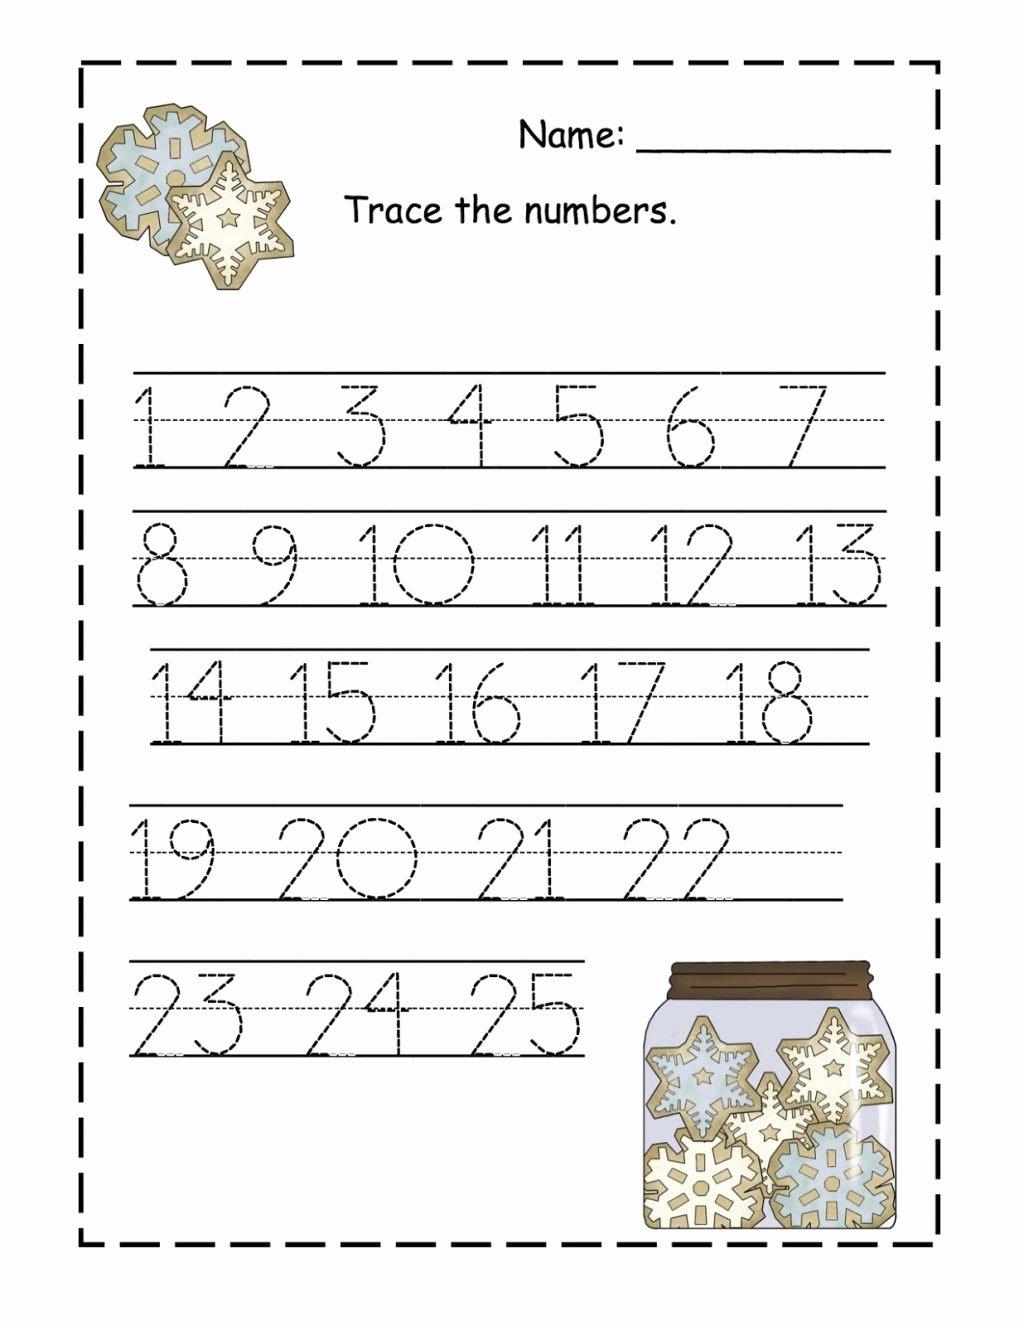 worksheet preschool printing worksheets fabulous ideas tracing printable name writing